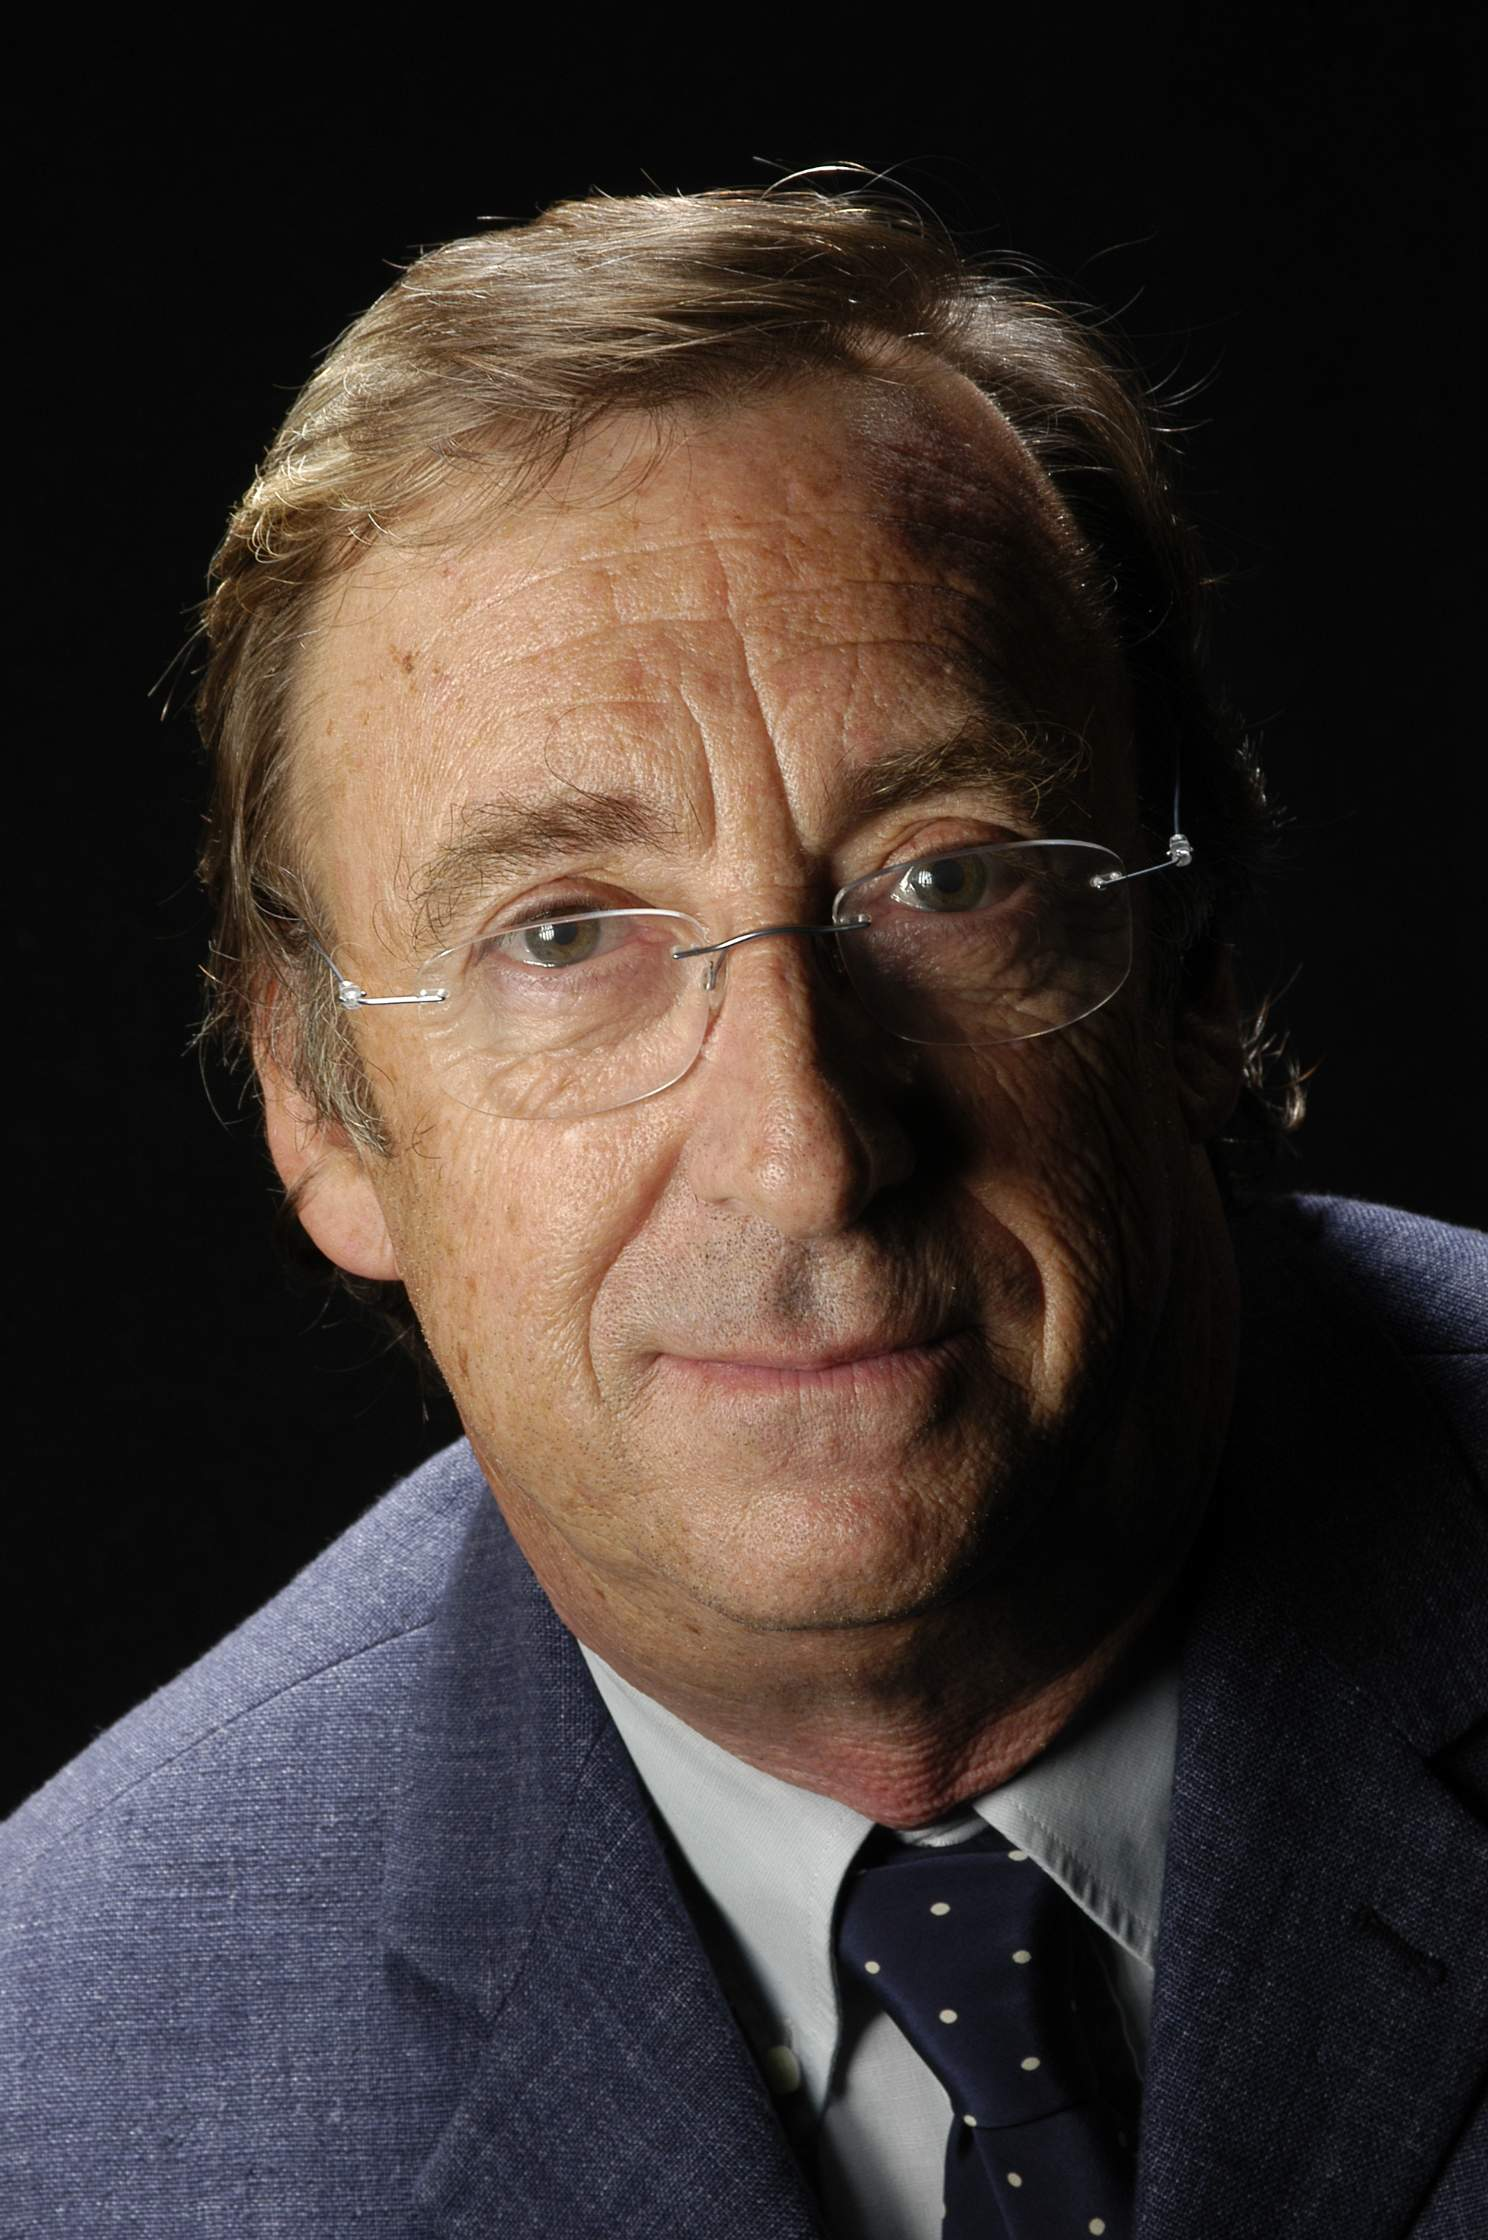 Dr. Josep Fargas Riera